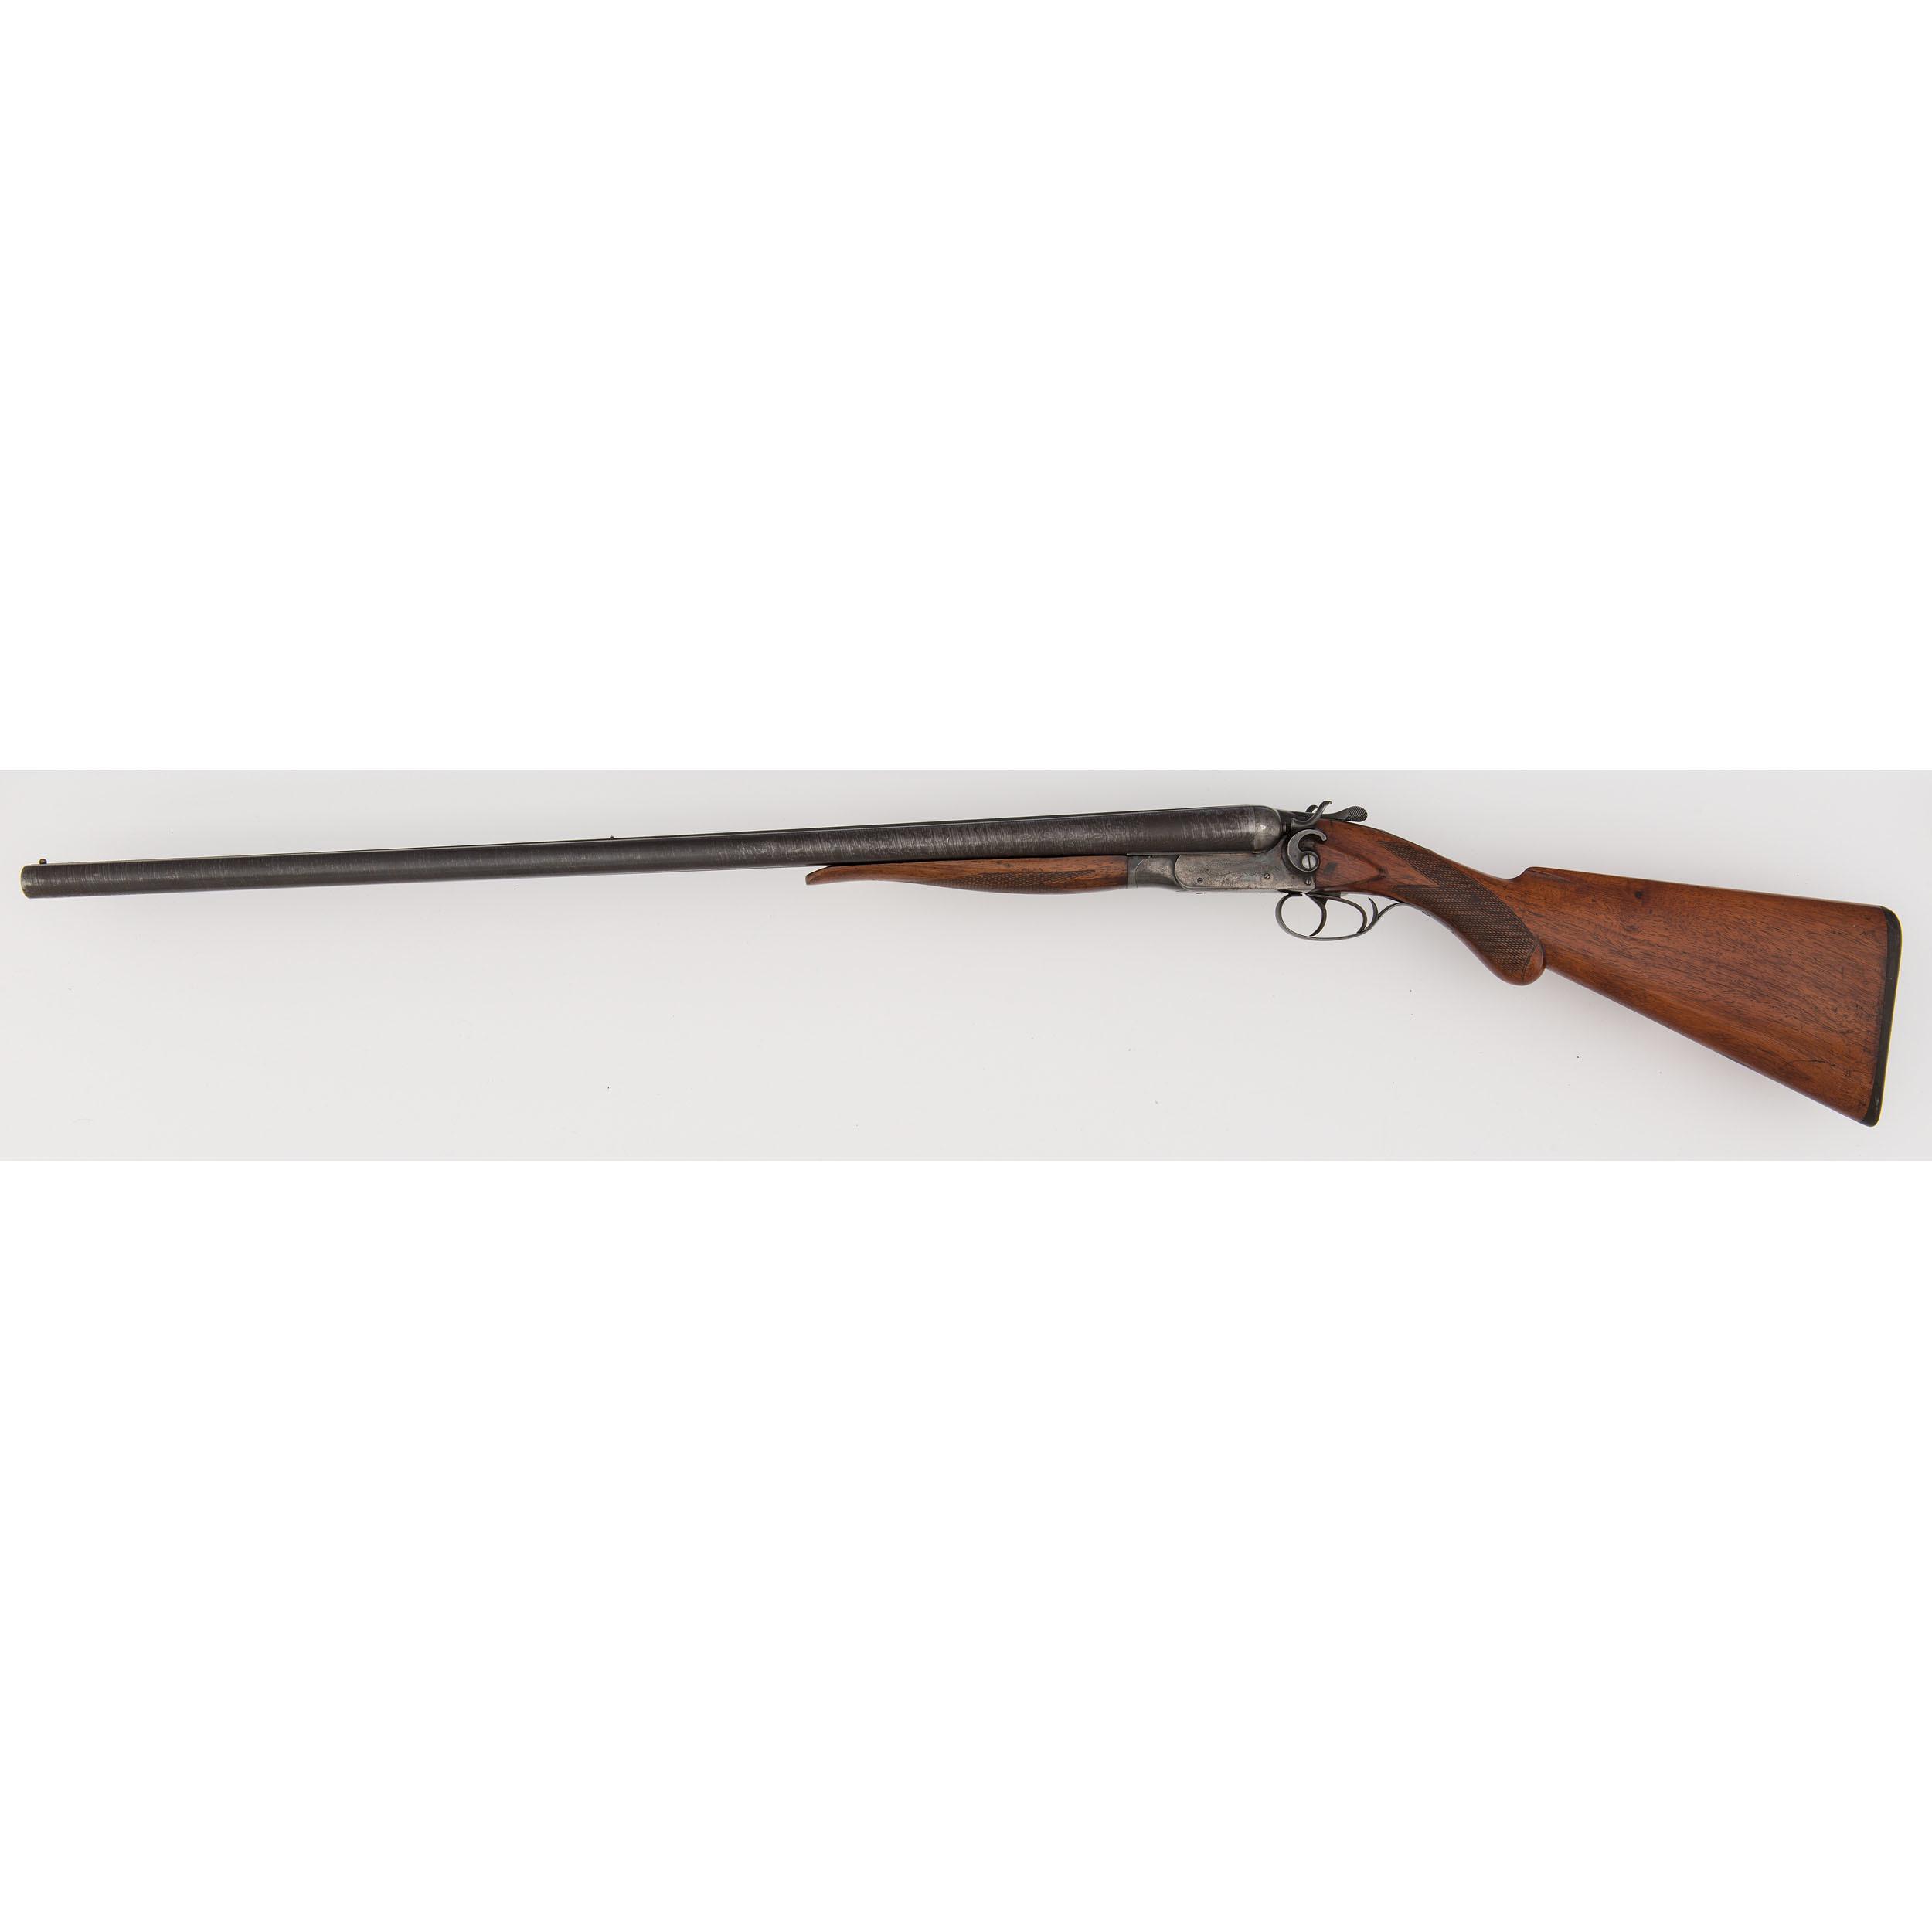 New Ithaca Double Barrel Hammer Shotgun | Cowan's Auction